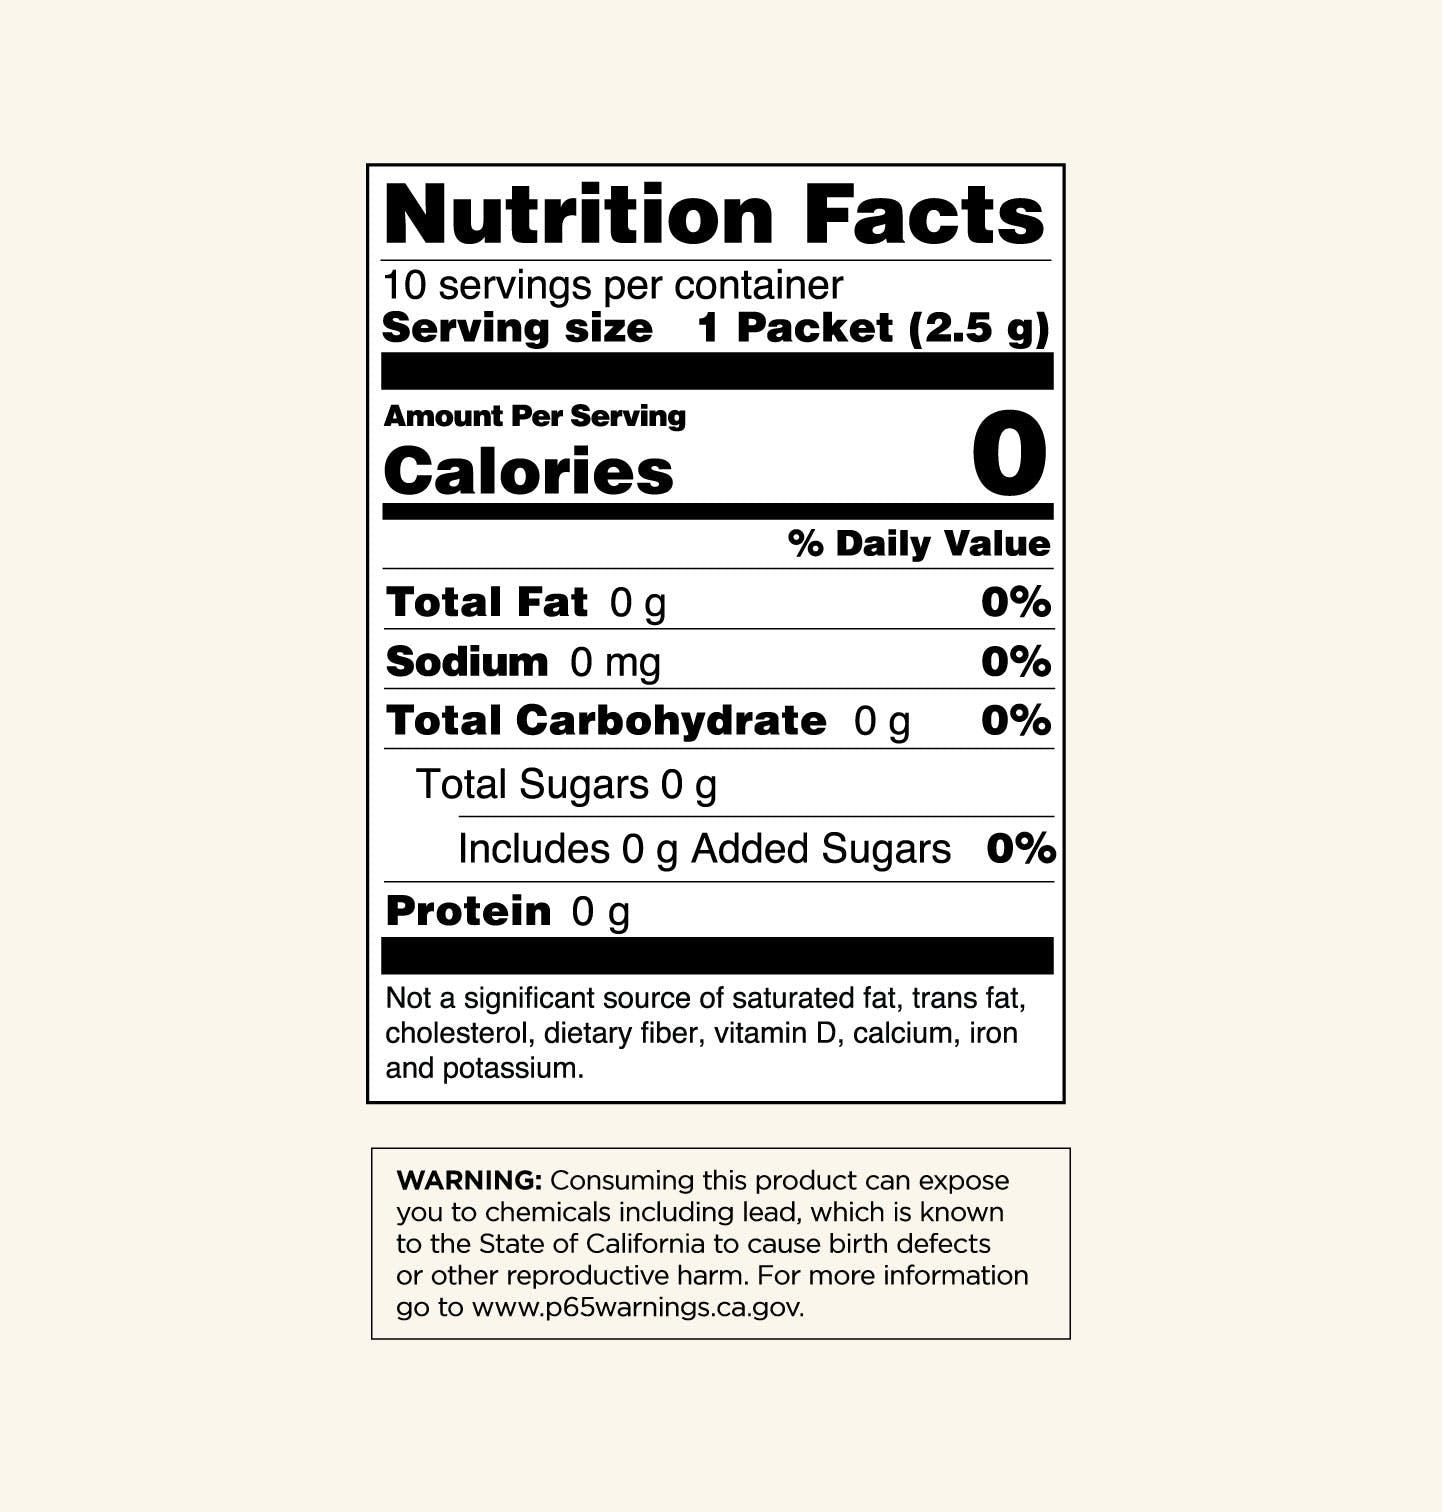 Mushroom Coffee with Chaga Nutrition Facts Panel